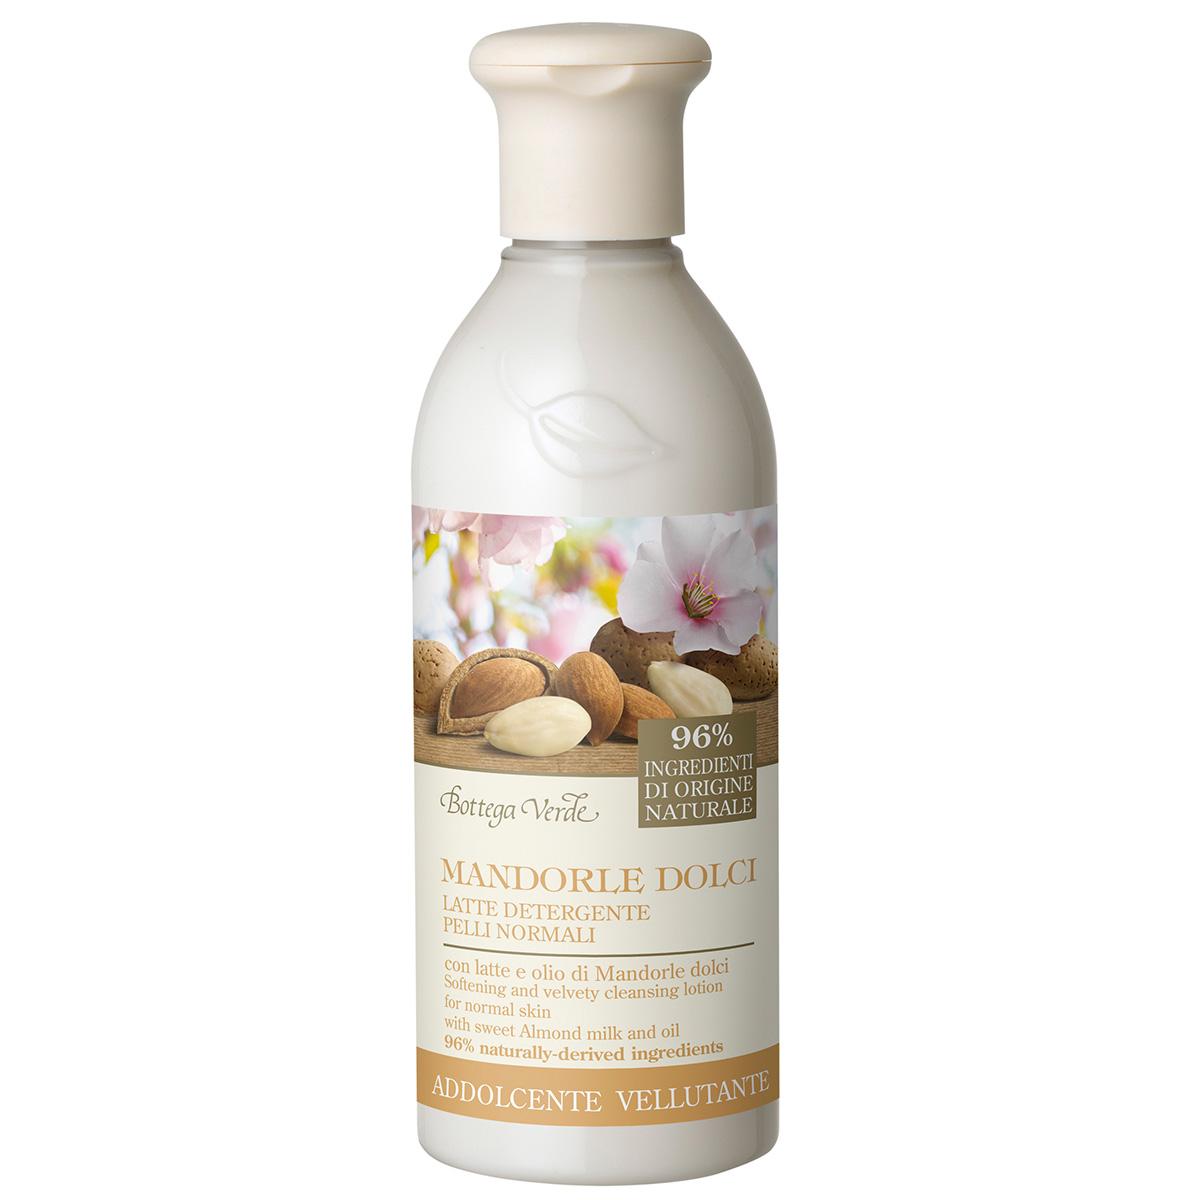 Migdale Dulci - Lapte demachiant, ten normal, linistitor si catifelat, cu lapte de migdale dulci si ulei